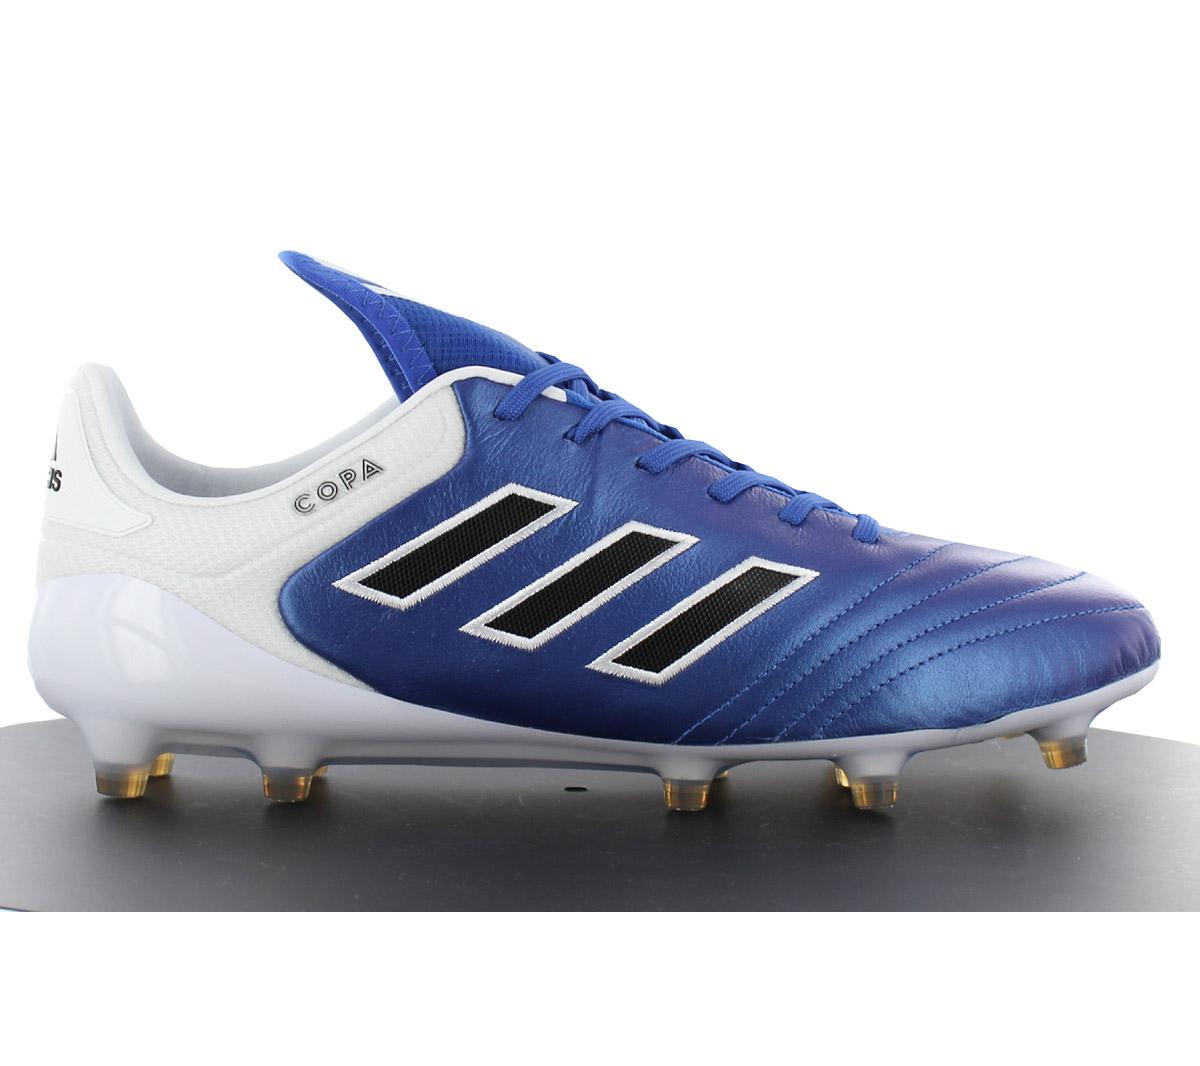 Détails sur Adidas Copa 17.1 Fg Hommes Chaussures Cuir Bleu Crampons Mundial BA8516 Neuf